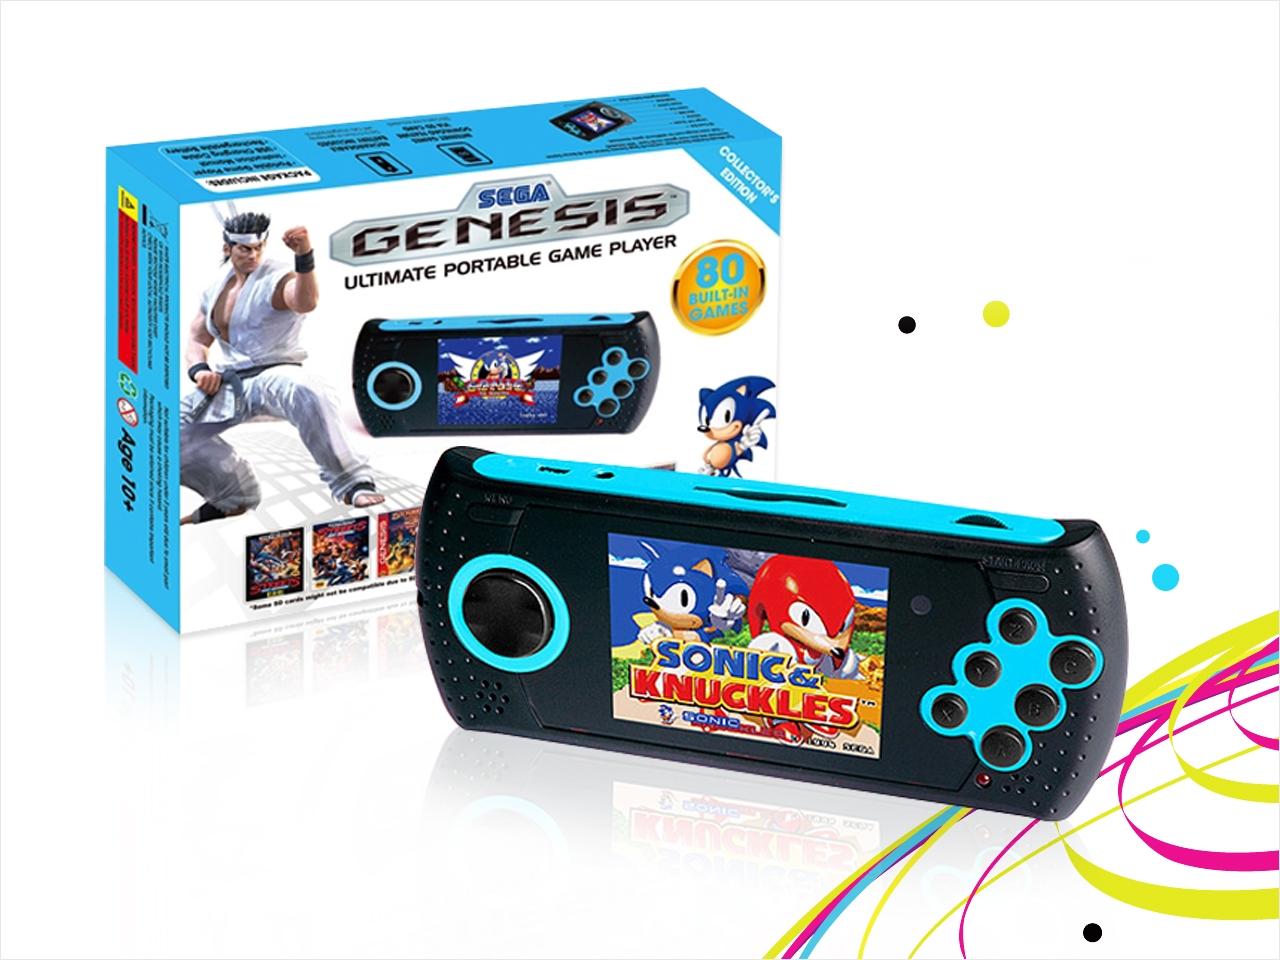 Portable Genesis